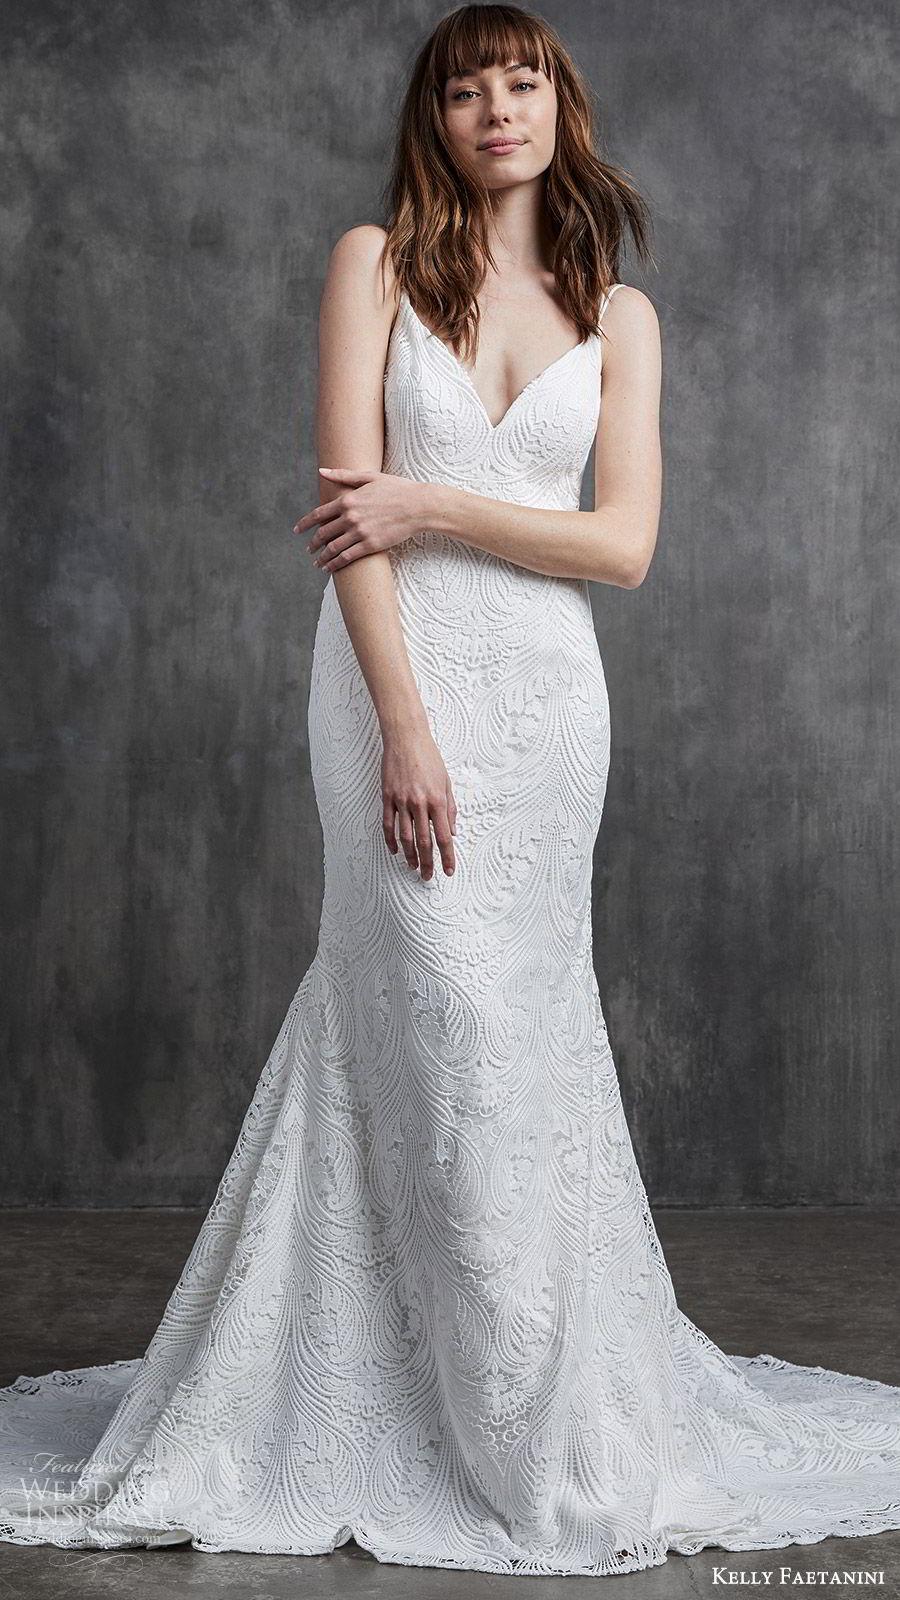 kelly faetanini spring 2020 bridal sleeveless thin strpas v neckline sheath mermaid lace wedding dress (3) low back chapel train elegant mv